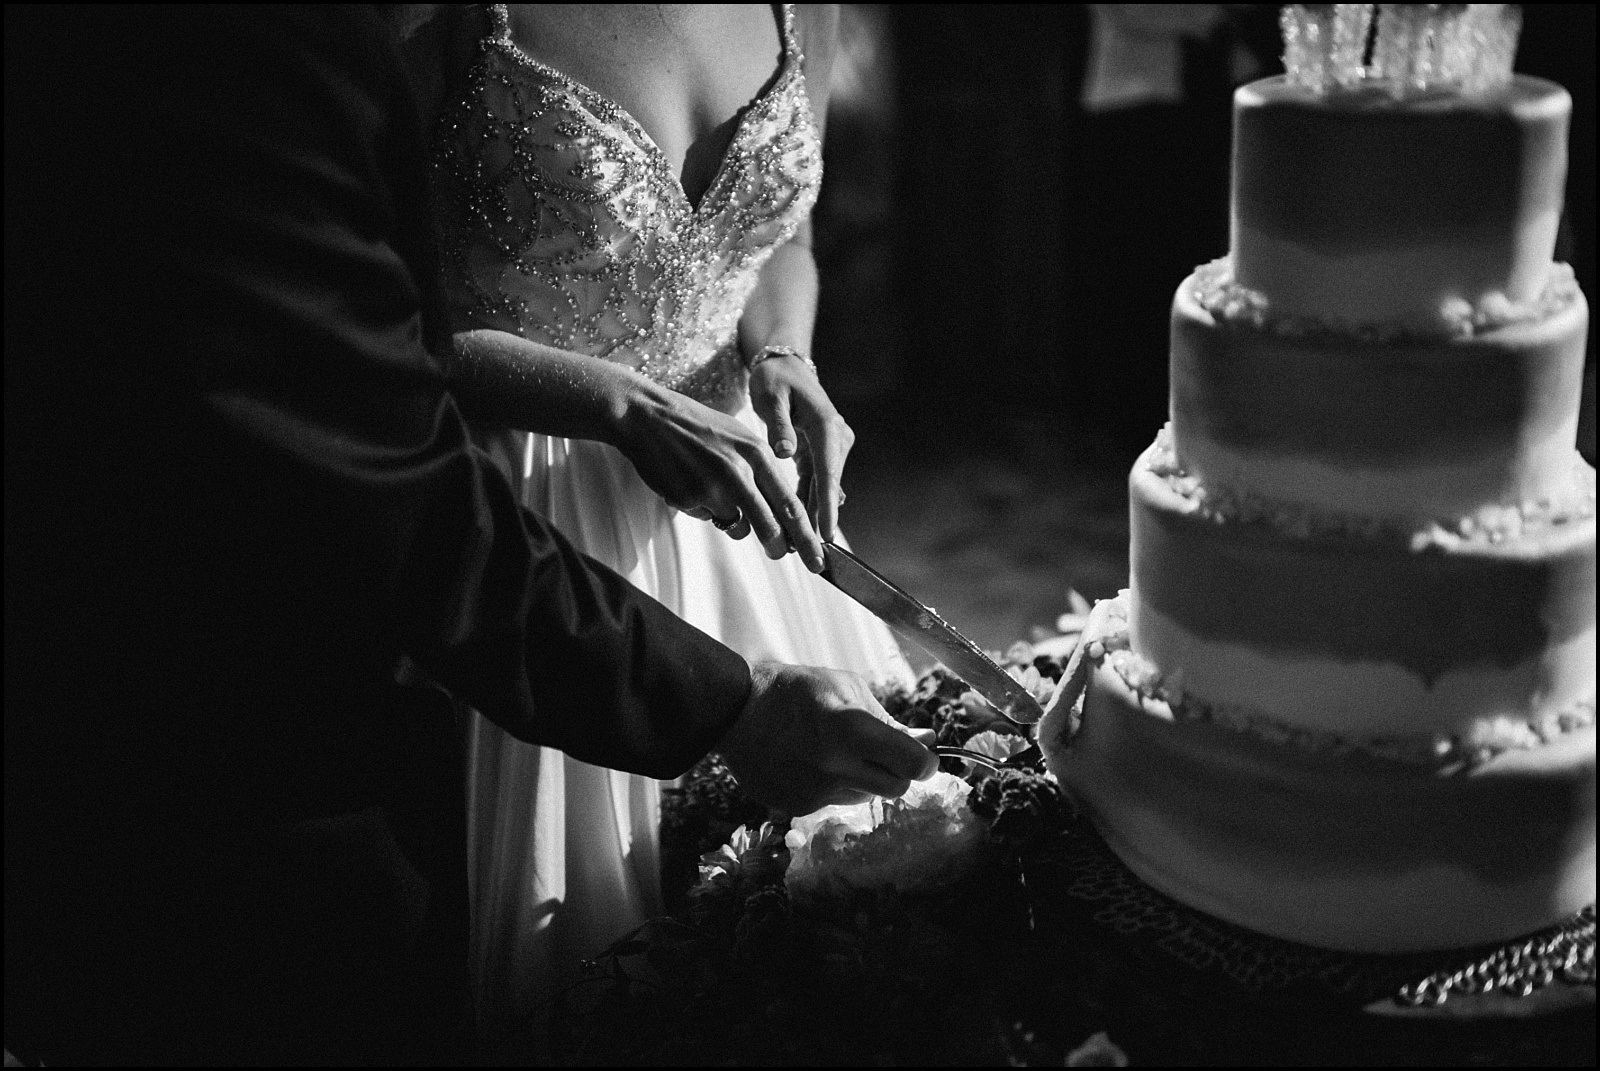 Cutting the cake at fall wedding